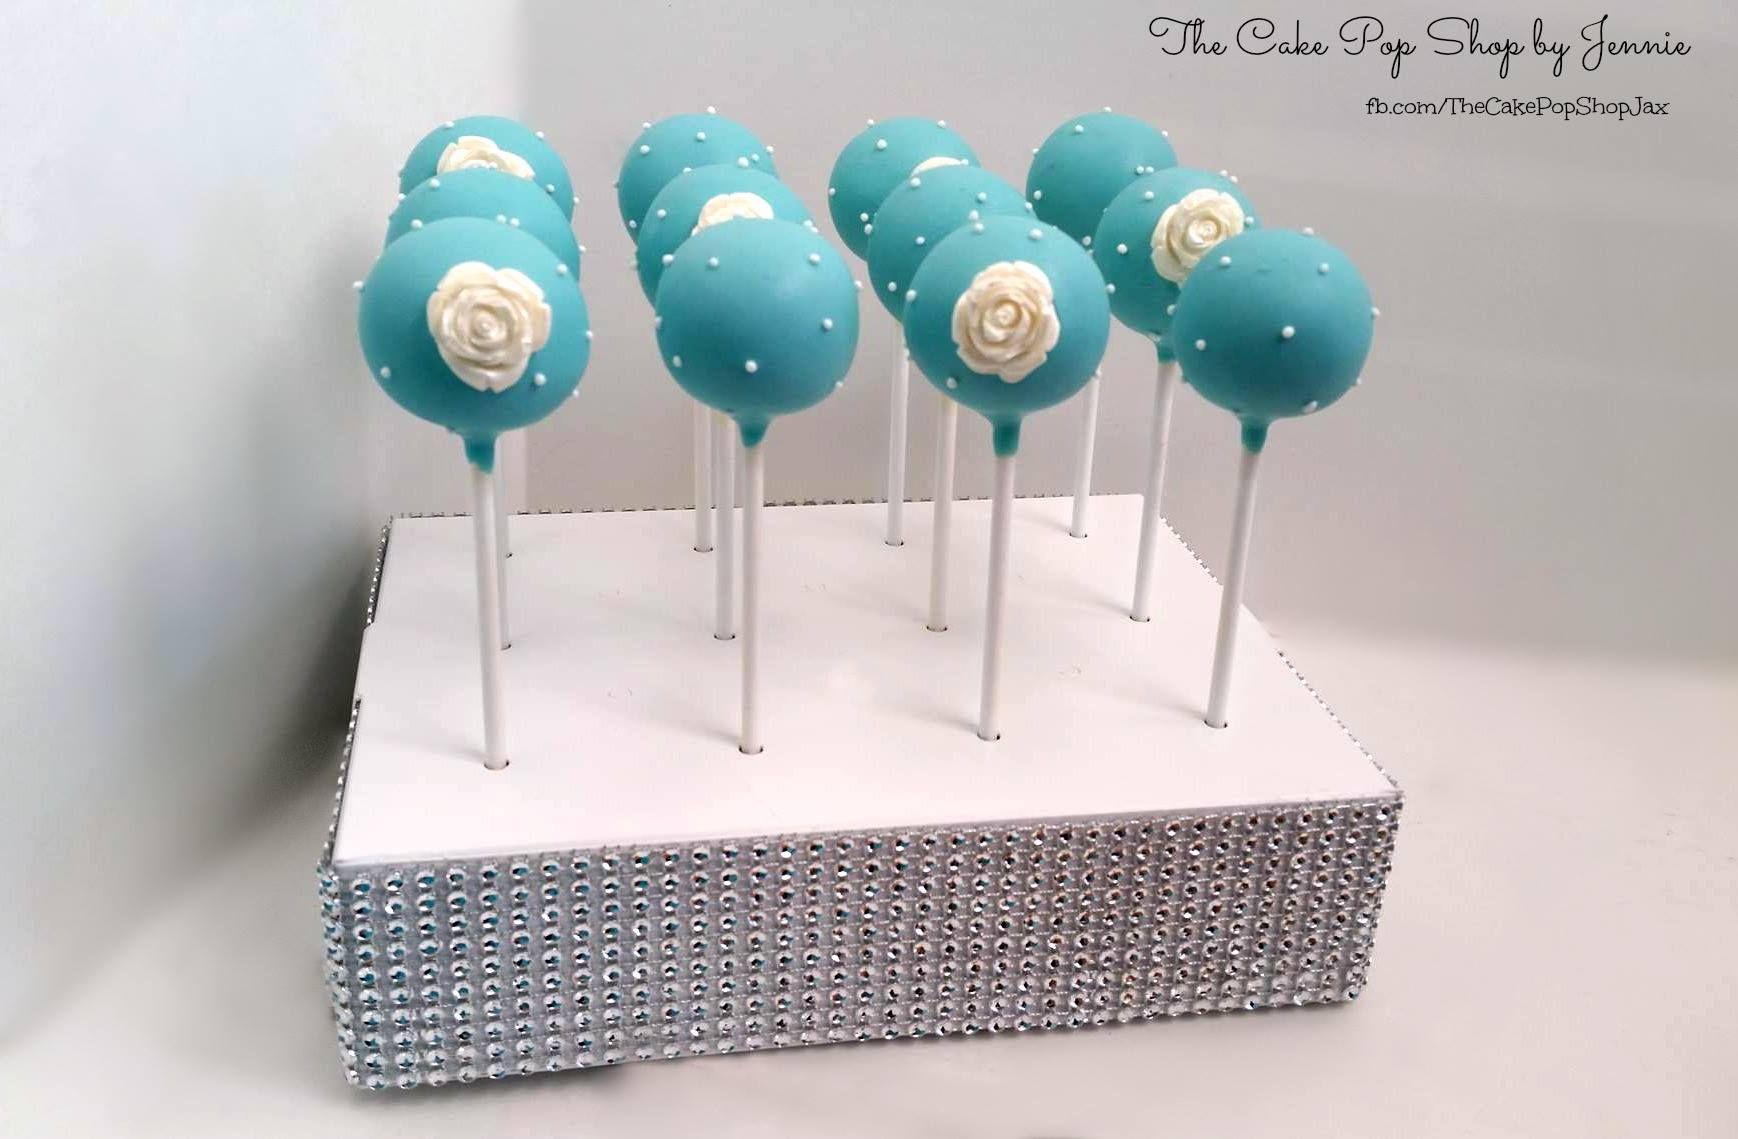 cake pop ideas wedding shower%0A Tiffany color cake pops for a bridal shower  In a BRP box shop cake pop